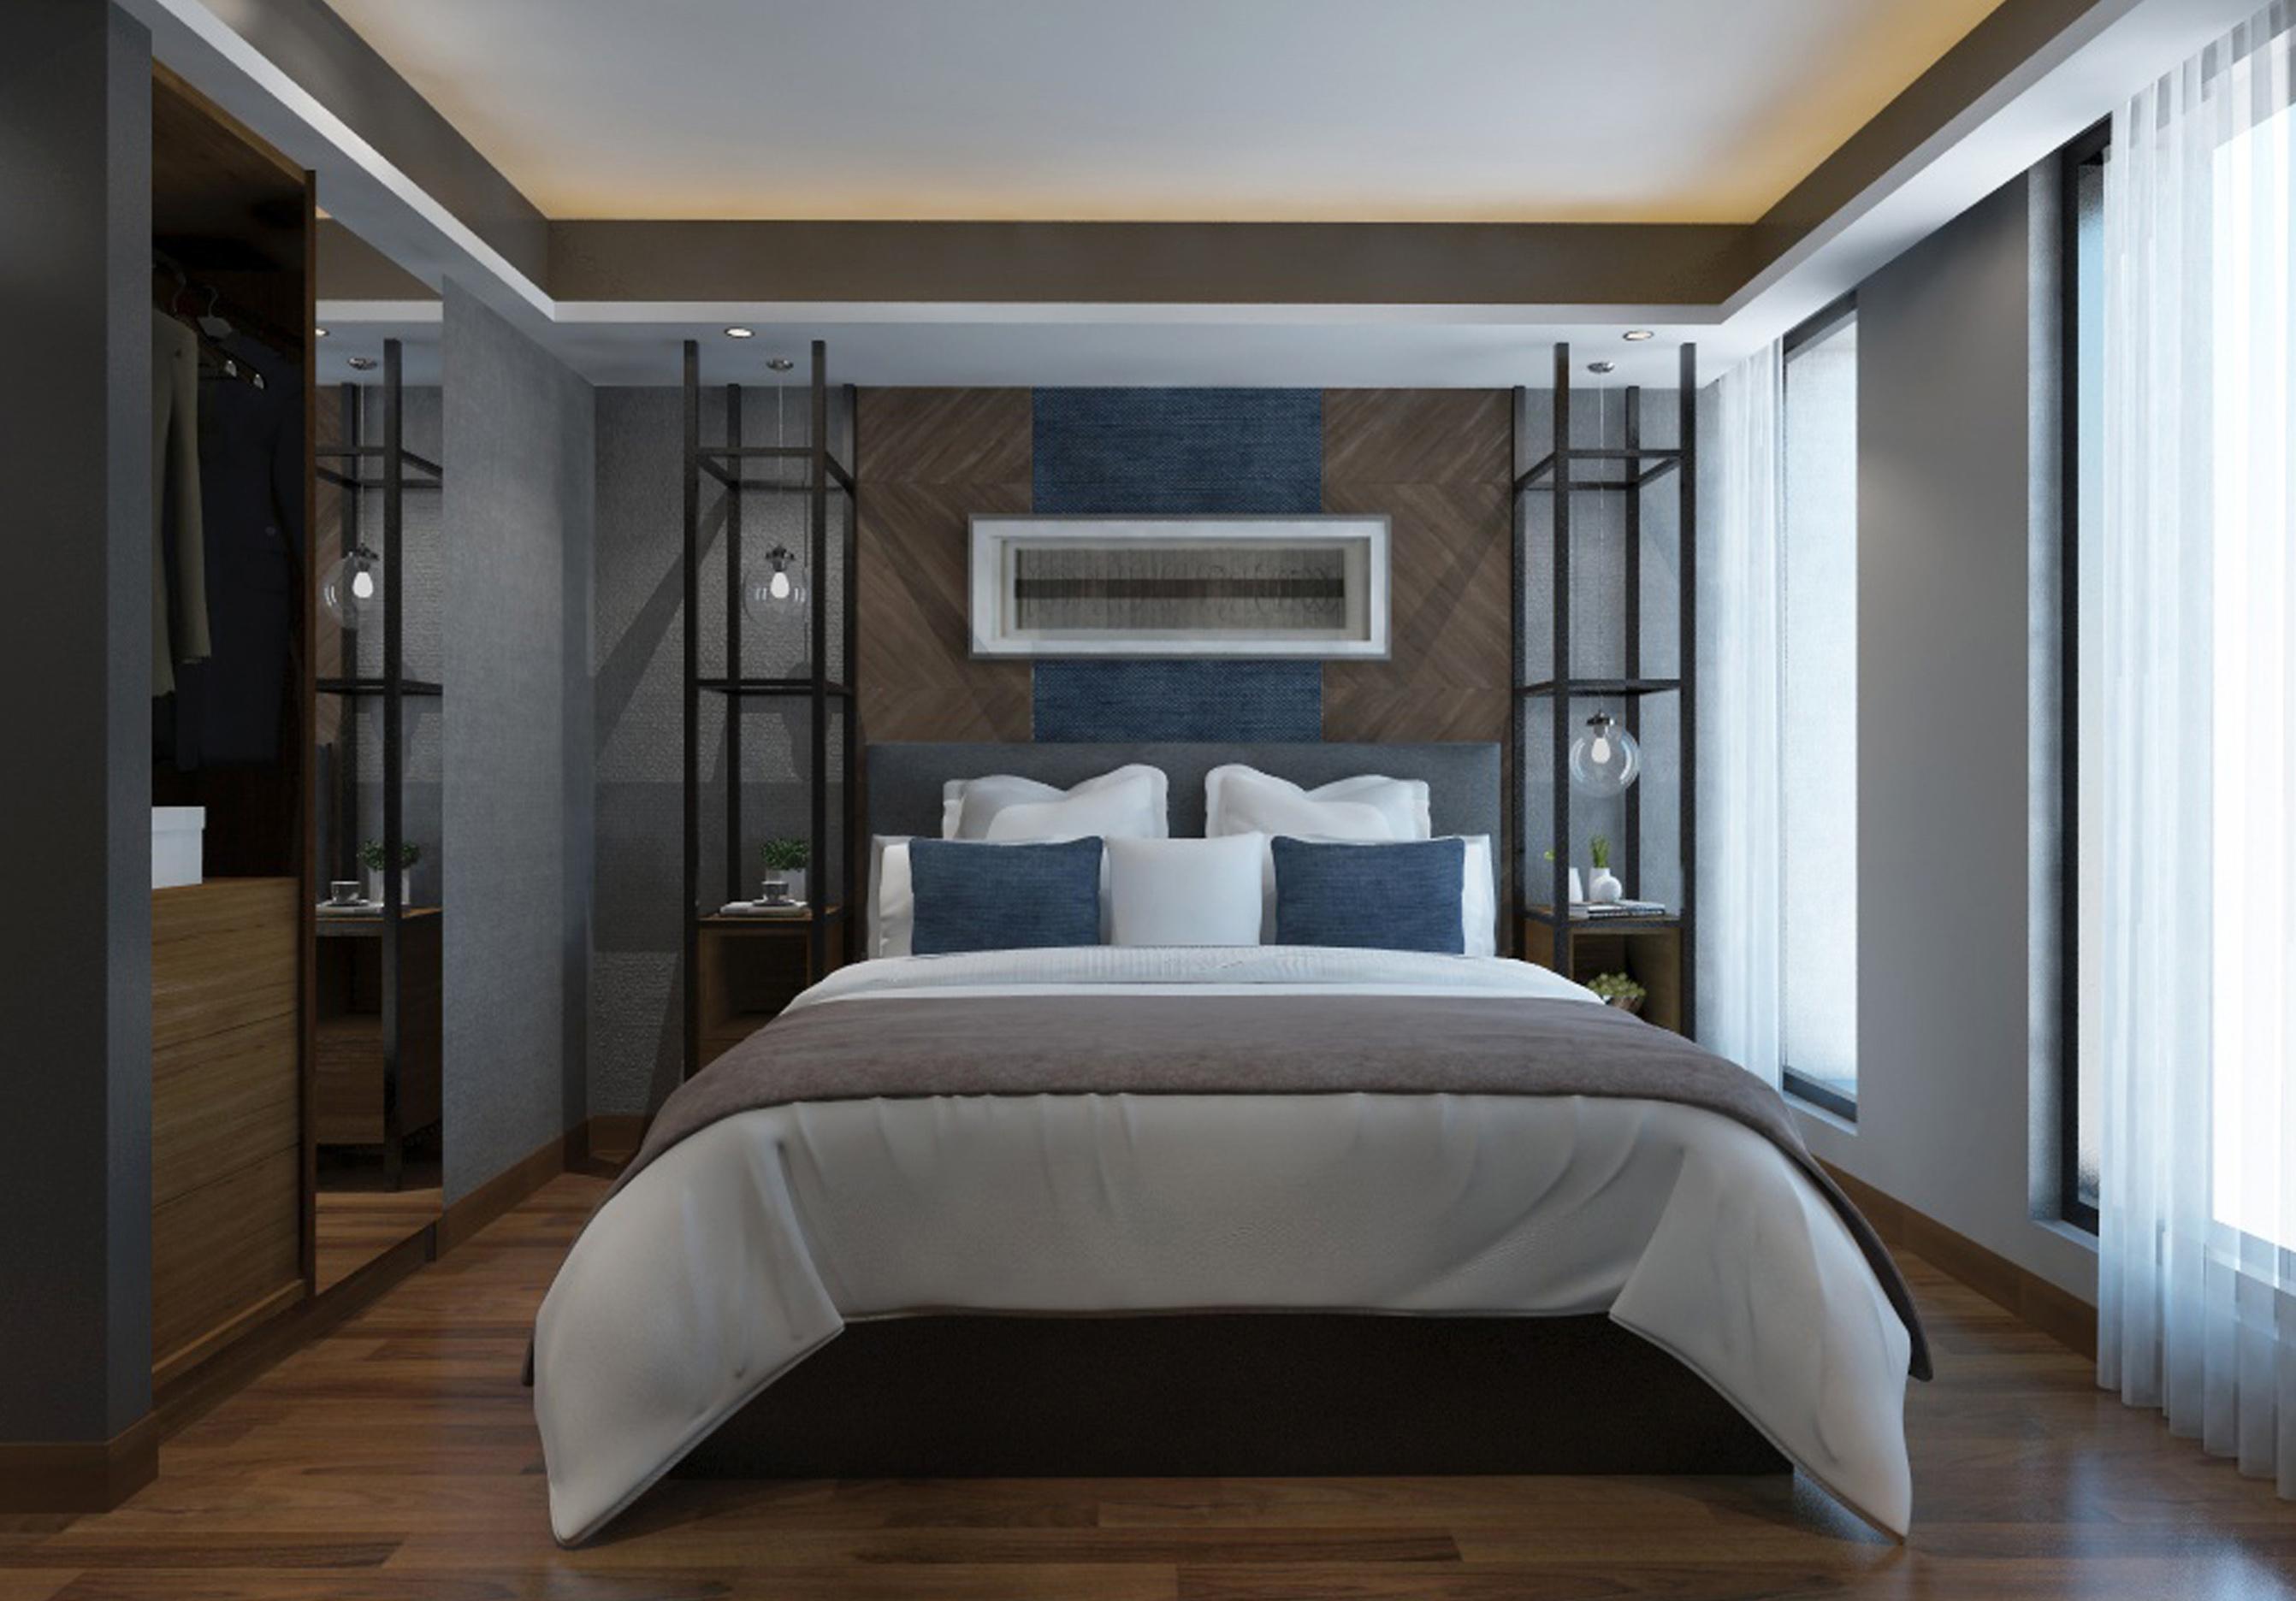 Yalçındağ Hotel